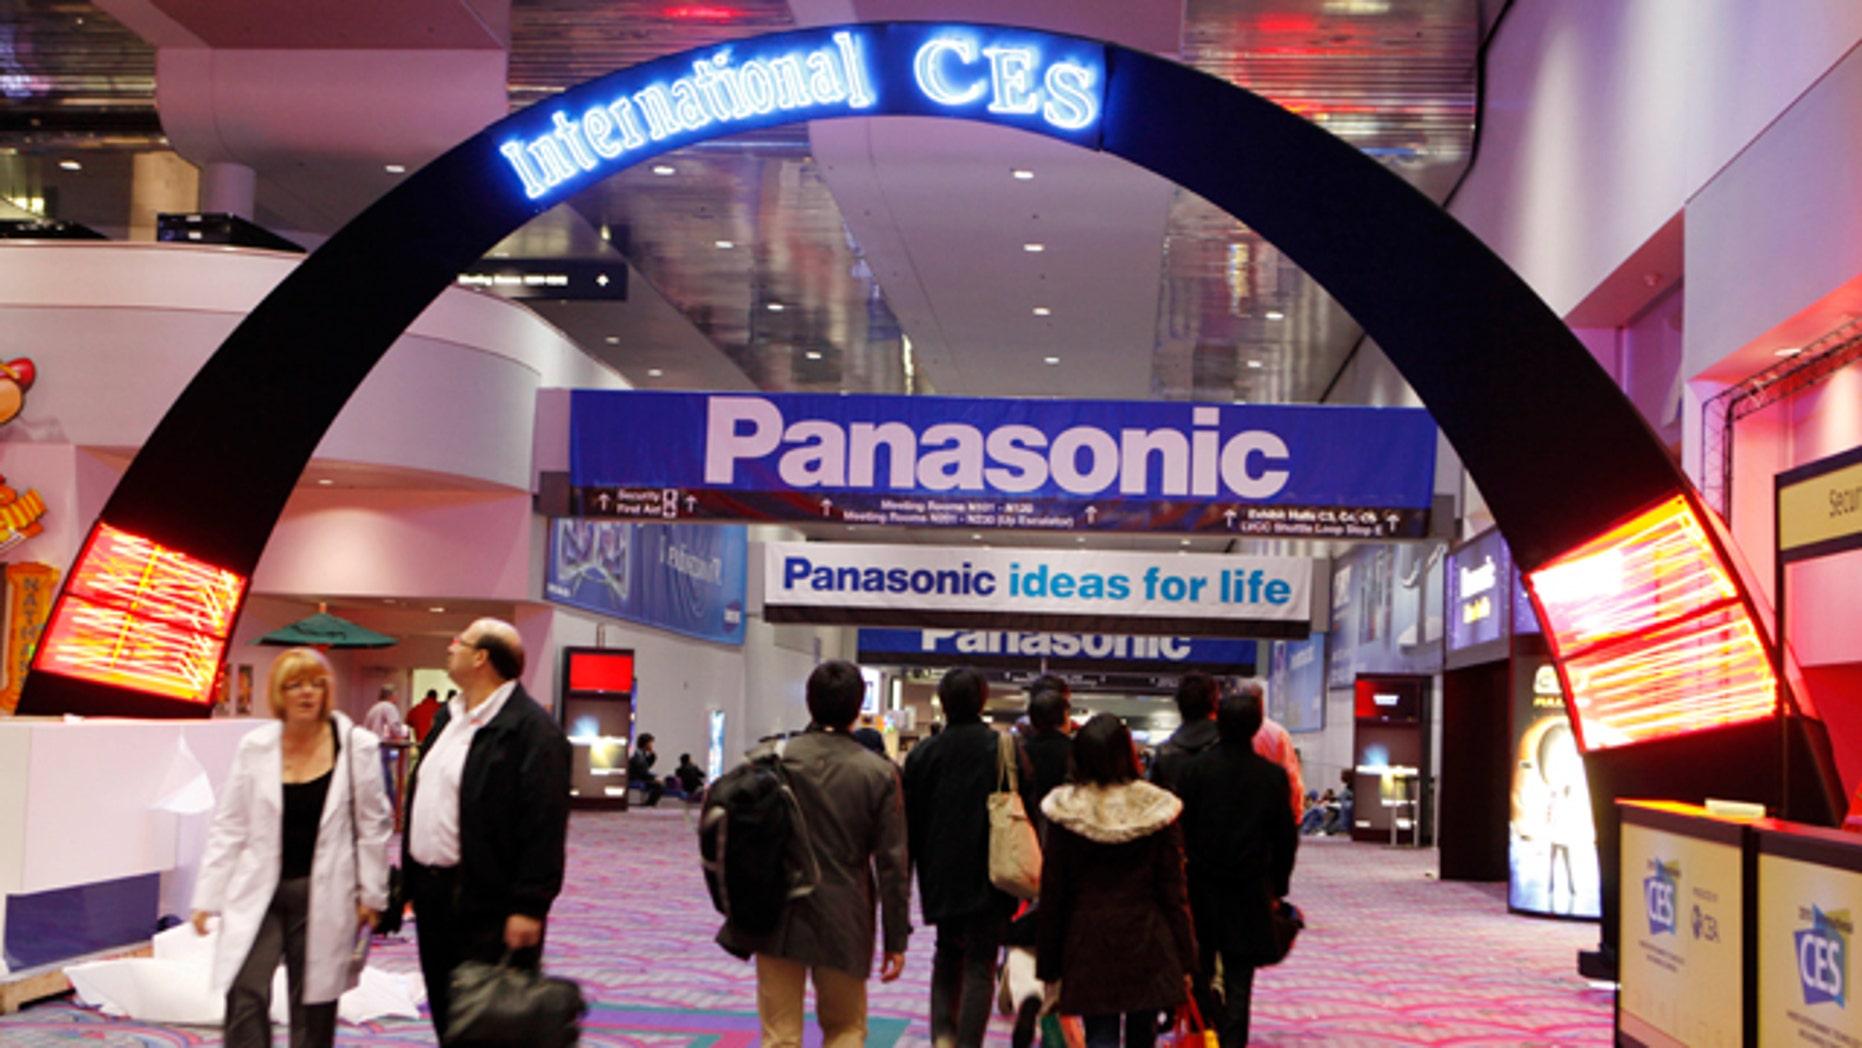 Jan. 4, 2010: People walk inside the International Consumer Electronics Show (CES) in Las Vegas.